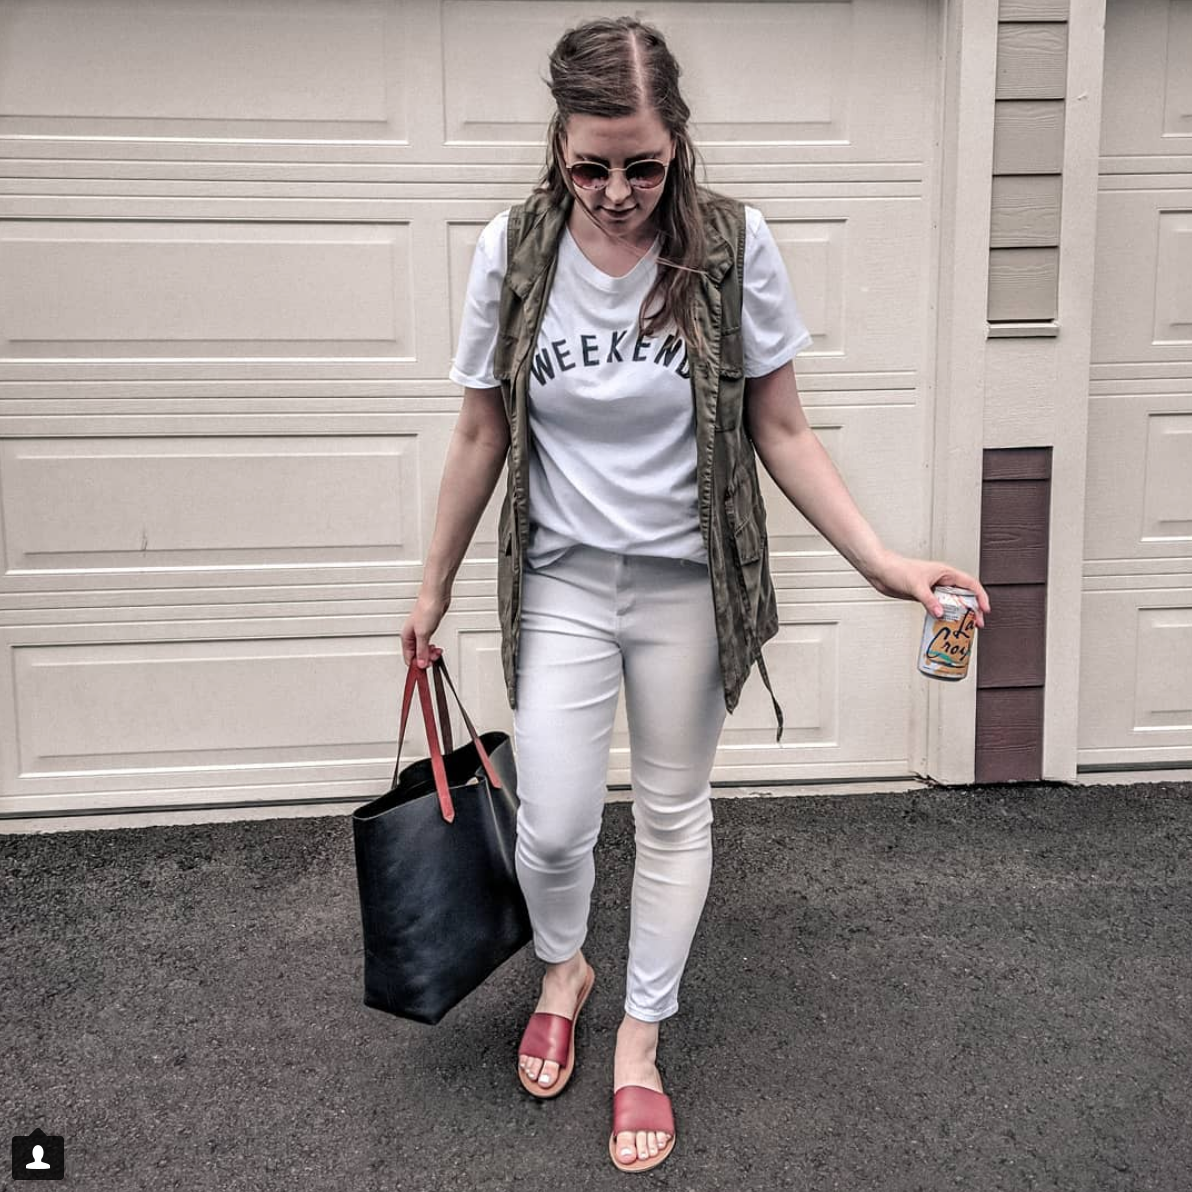 Cargo Vest - Top: GAP // Vest: SIMILAR(on sale) // Jeans: H&M (only $10!!!) // Sandals: TARGET // Bag: NORDSTROM// Sunglasses: RAYBAN or similar $14 dupe HERE